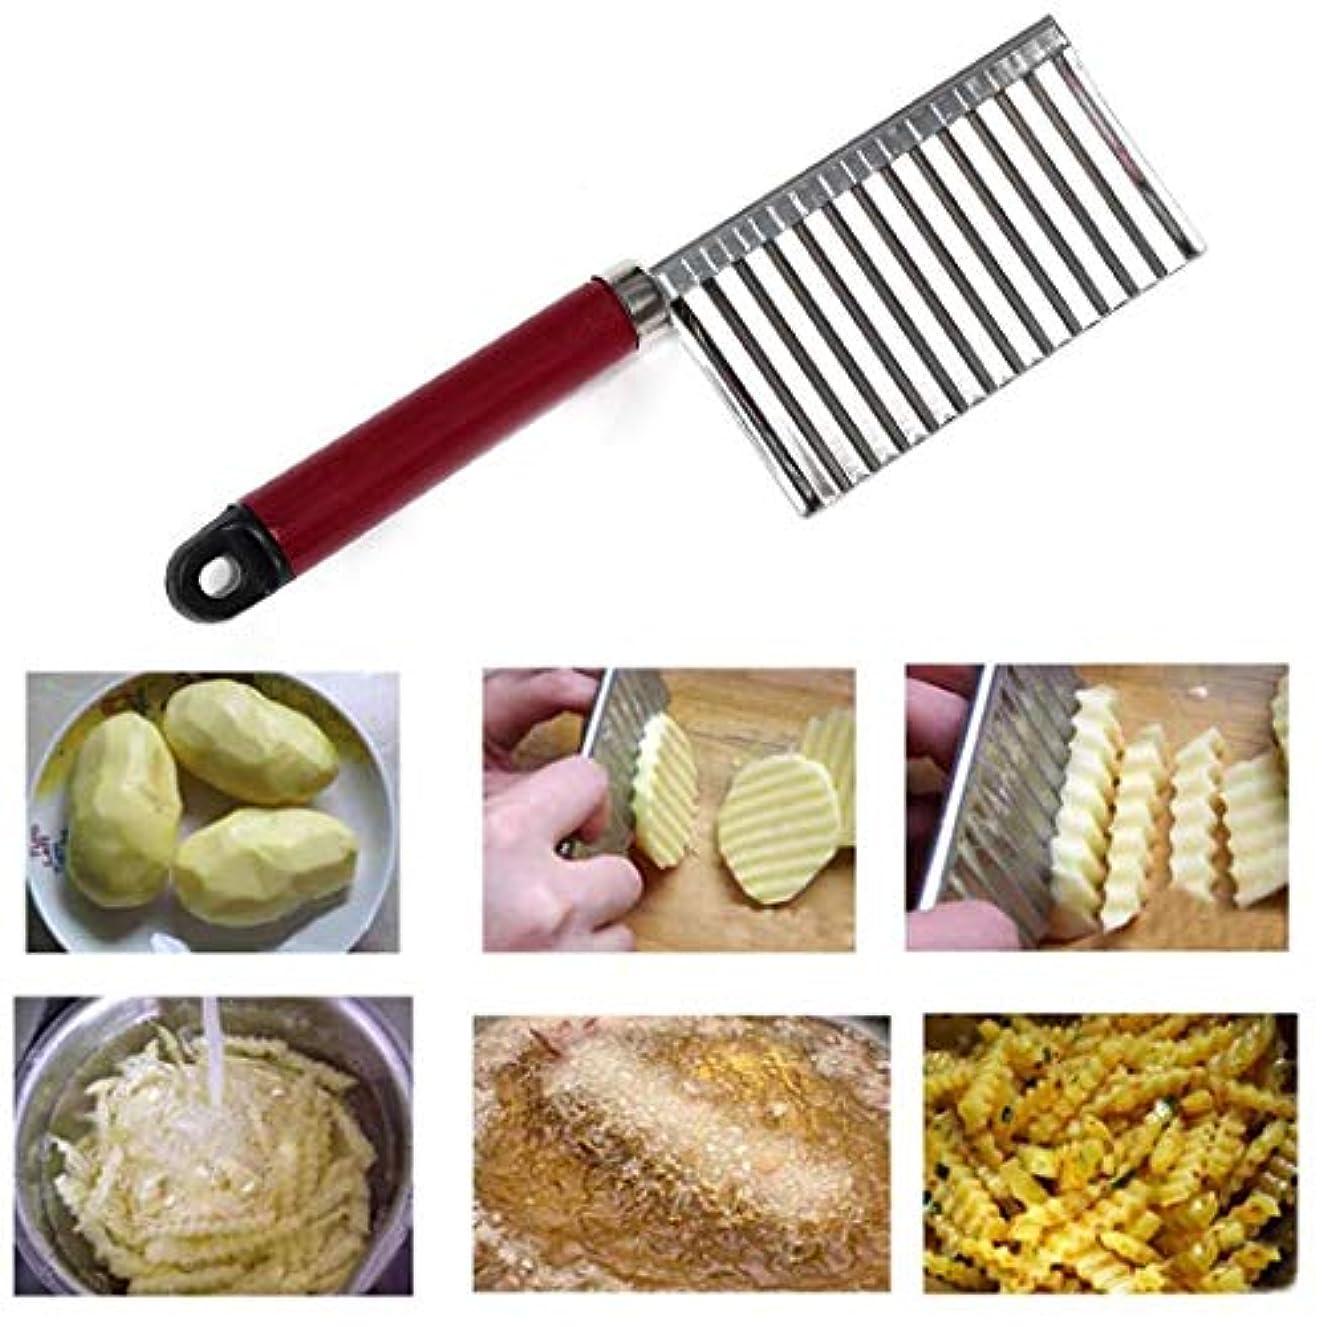 DREAMVAN Stainless Steel Potato Slice Cutter Vegetable Fruit Knife Kitchen Tool Peelers